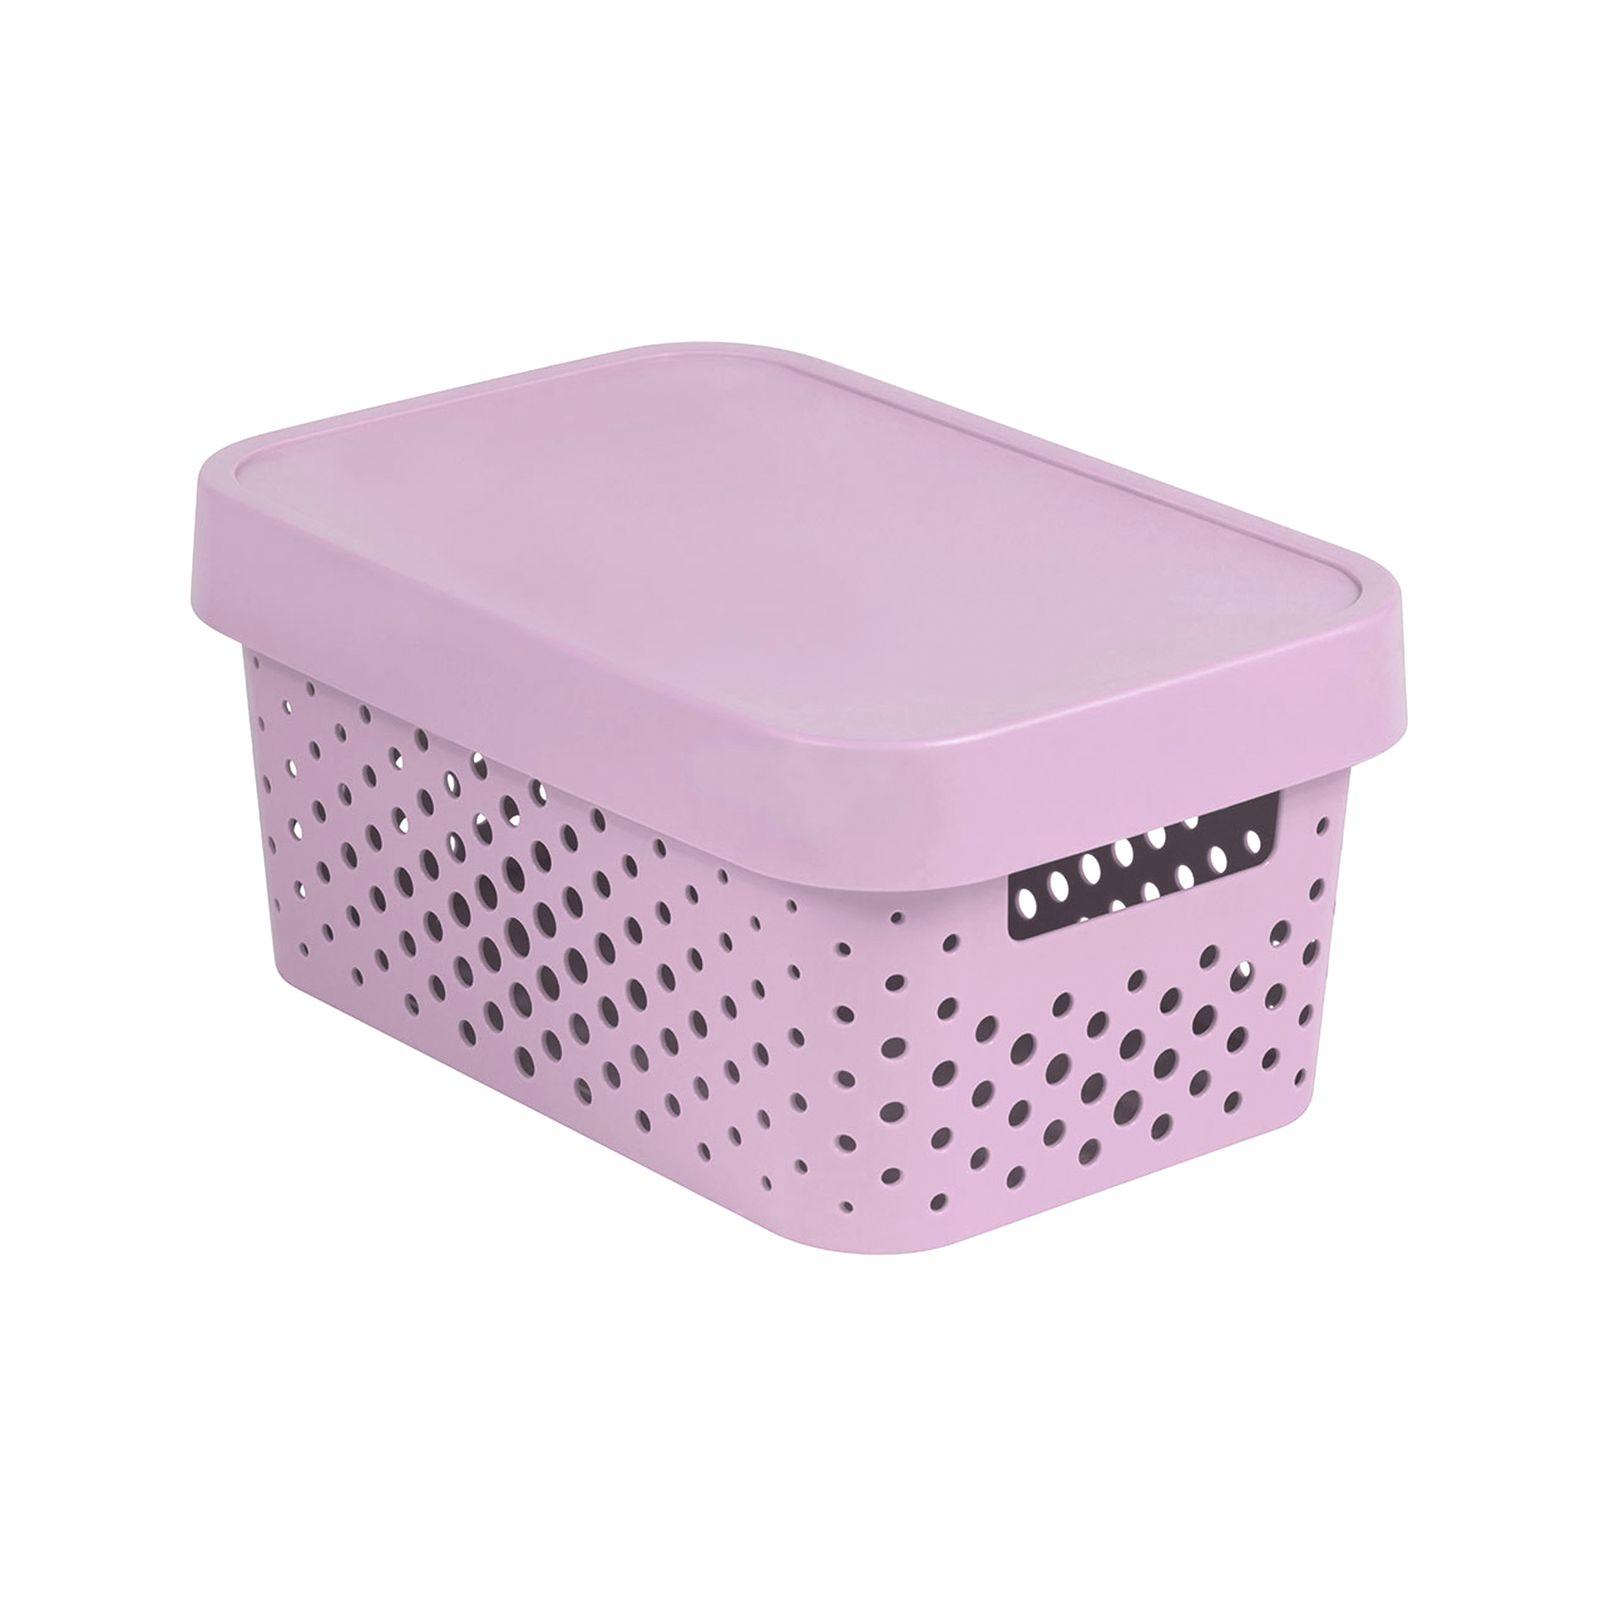 Caja perforada con tapa Infinity rosa 4,5 l CURVER